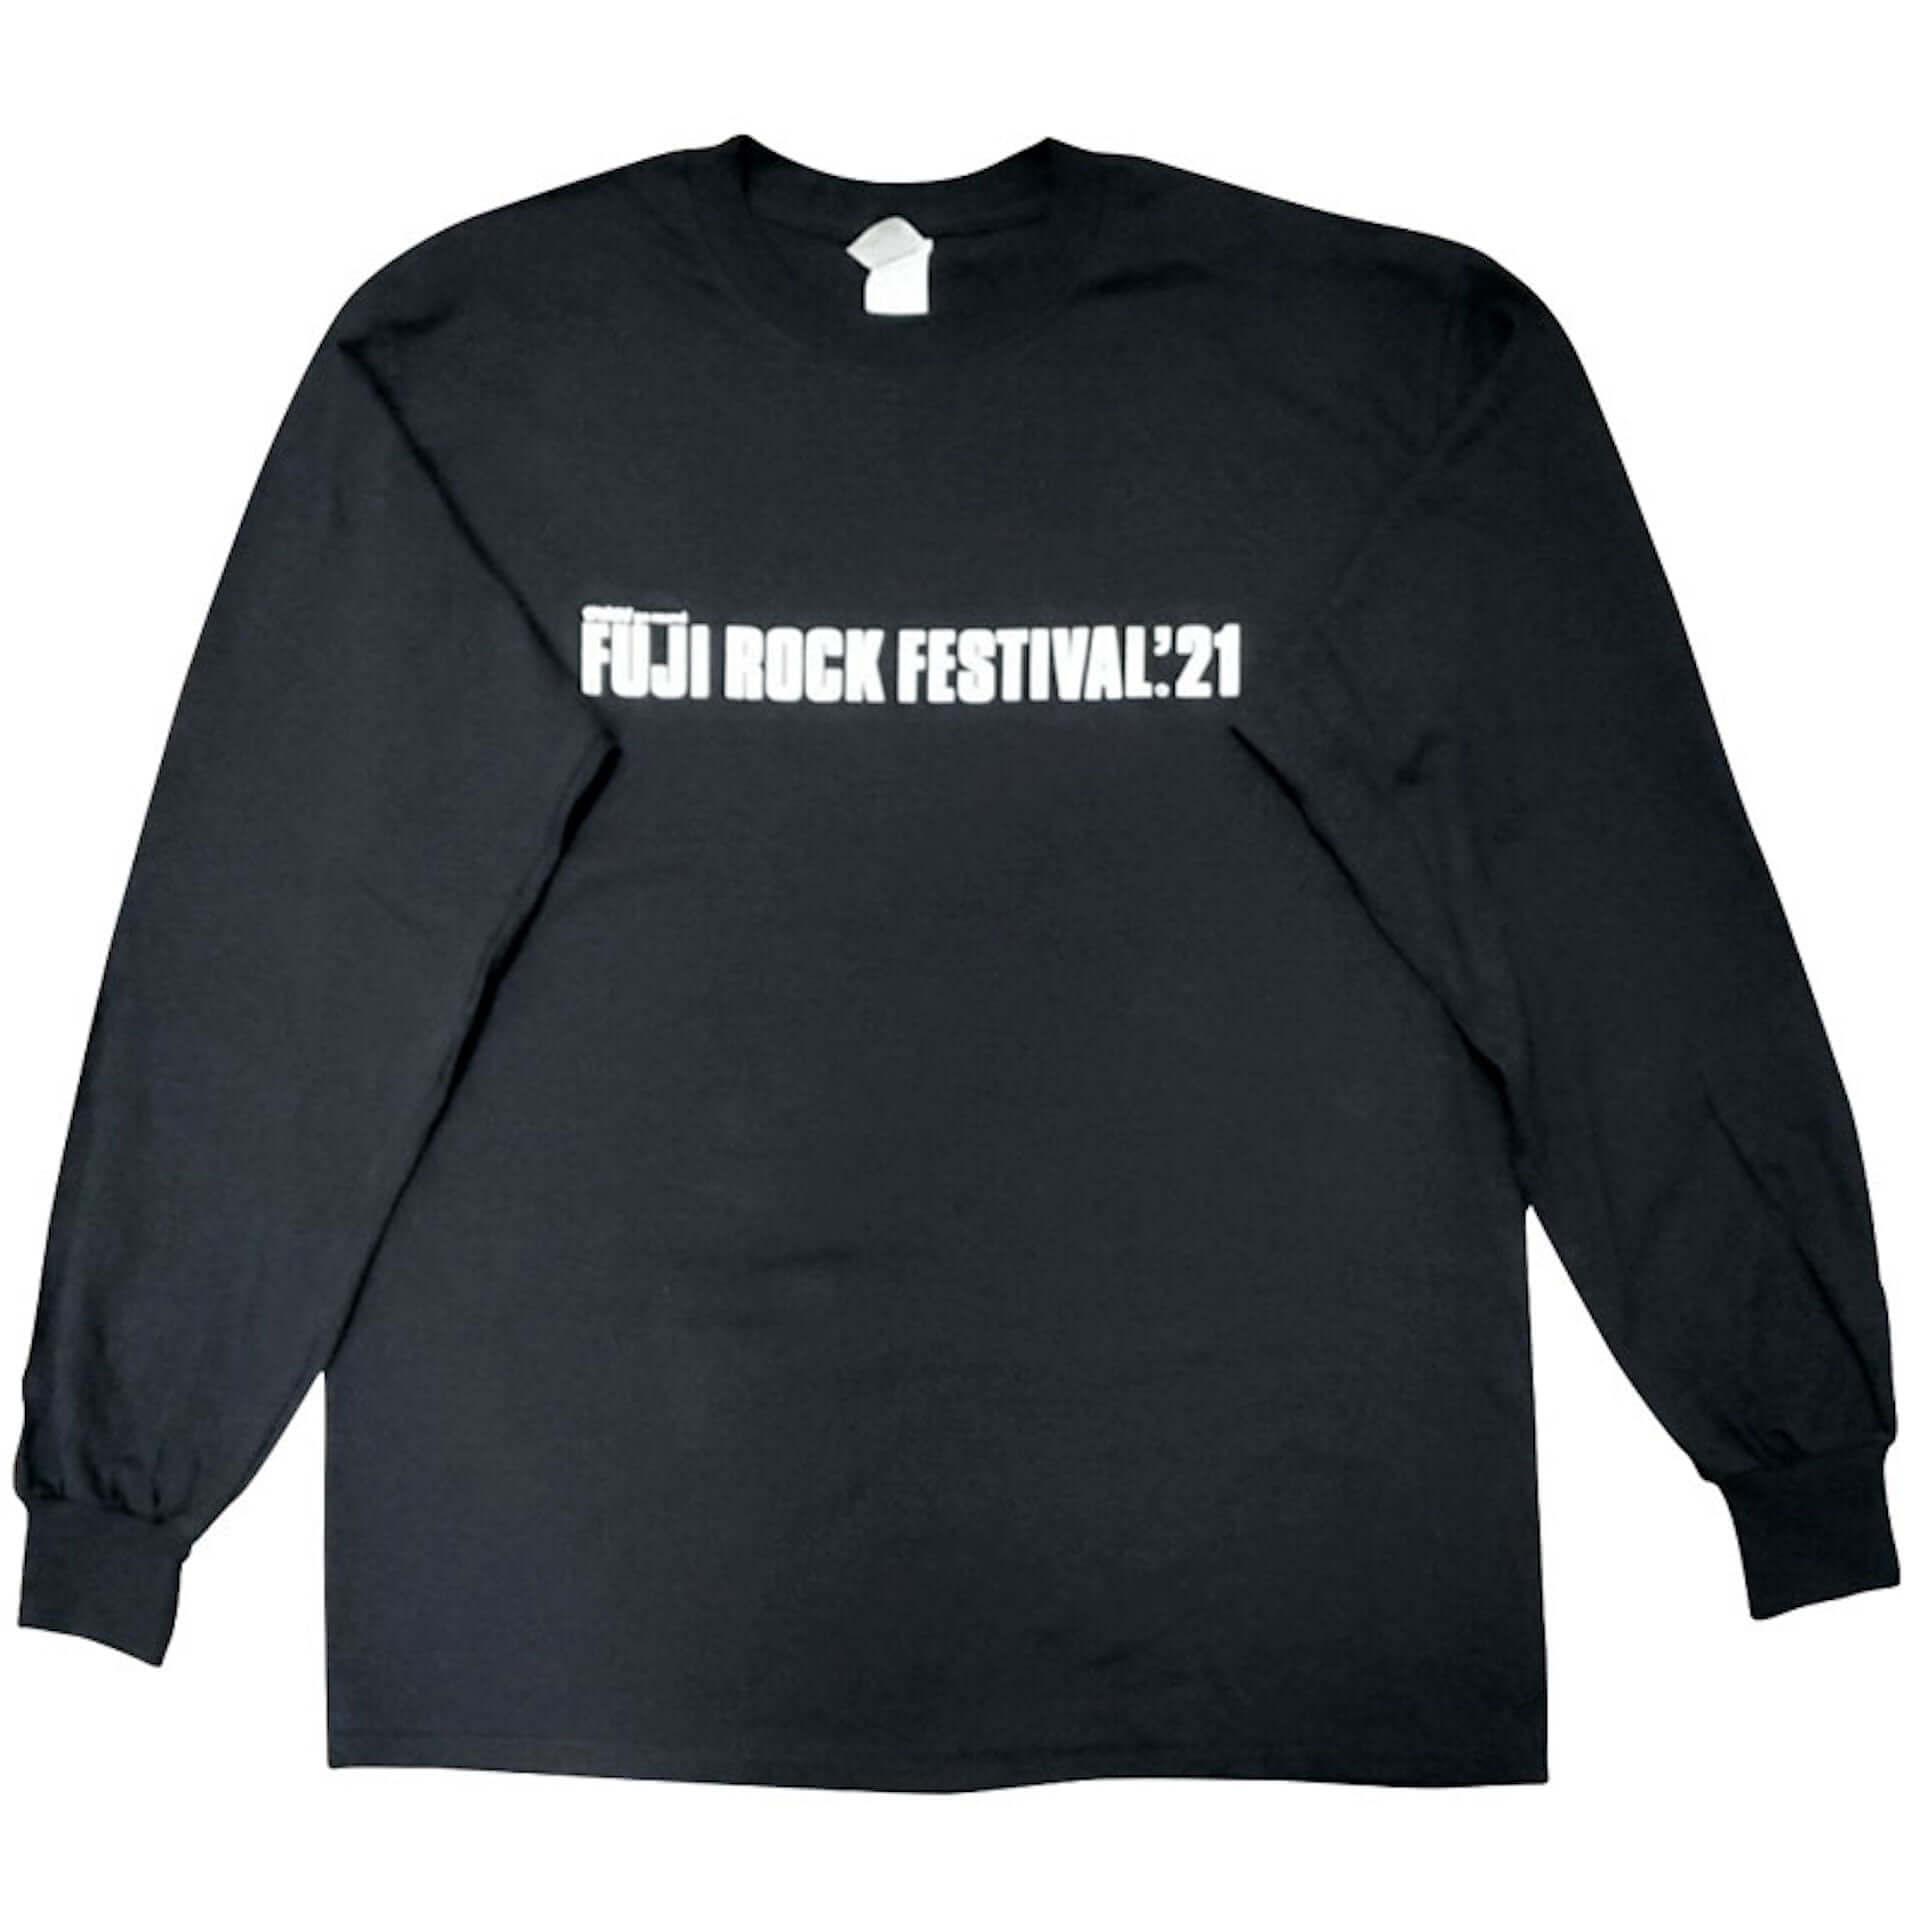 <FUJI ROCK FESTIVAL>公式グッズの新作が登場!大晦日イベント<KEEP ON FUJI ROCKIN' II>のチケットも明日発売 musicf201211_frf_12-1920x1920